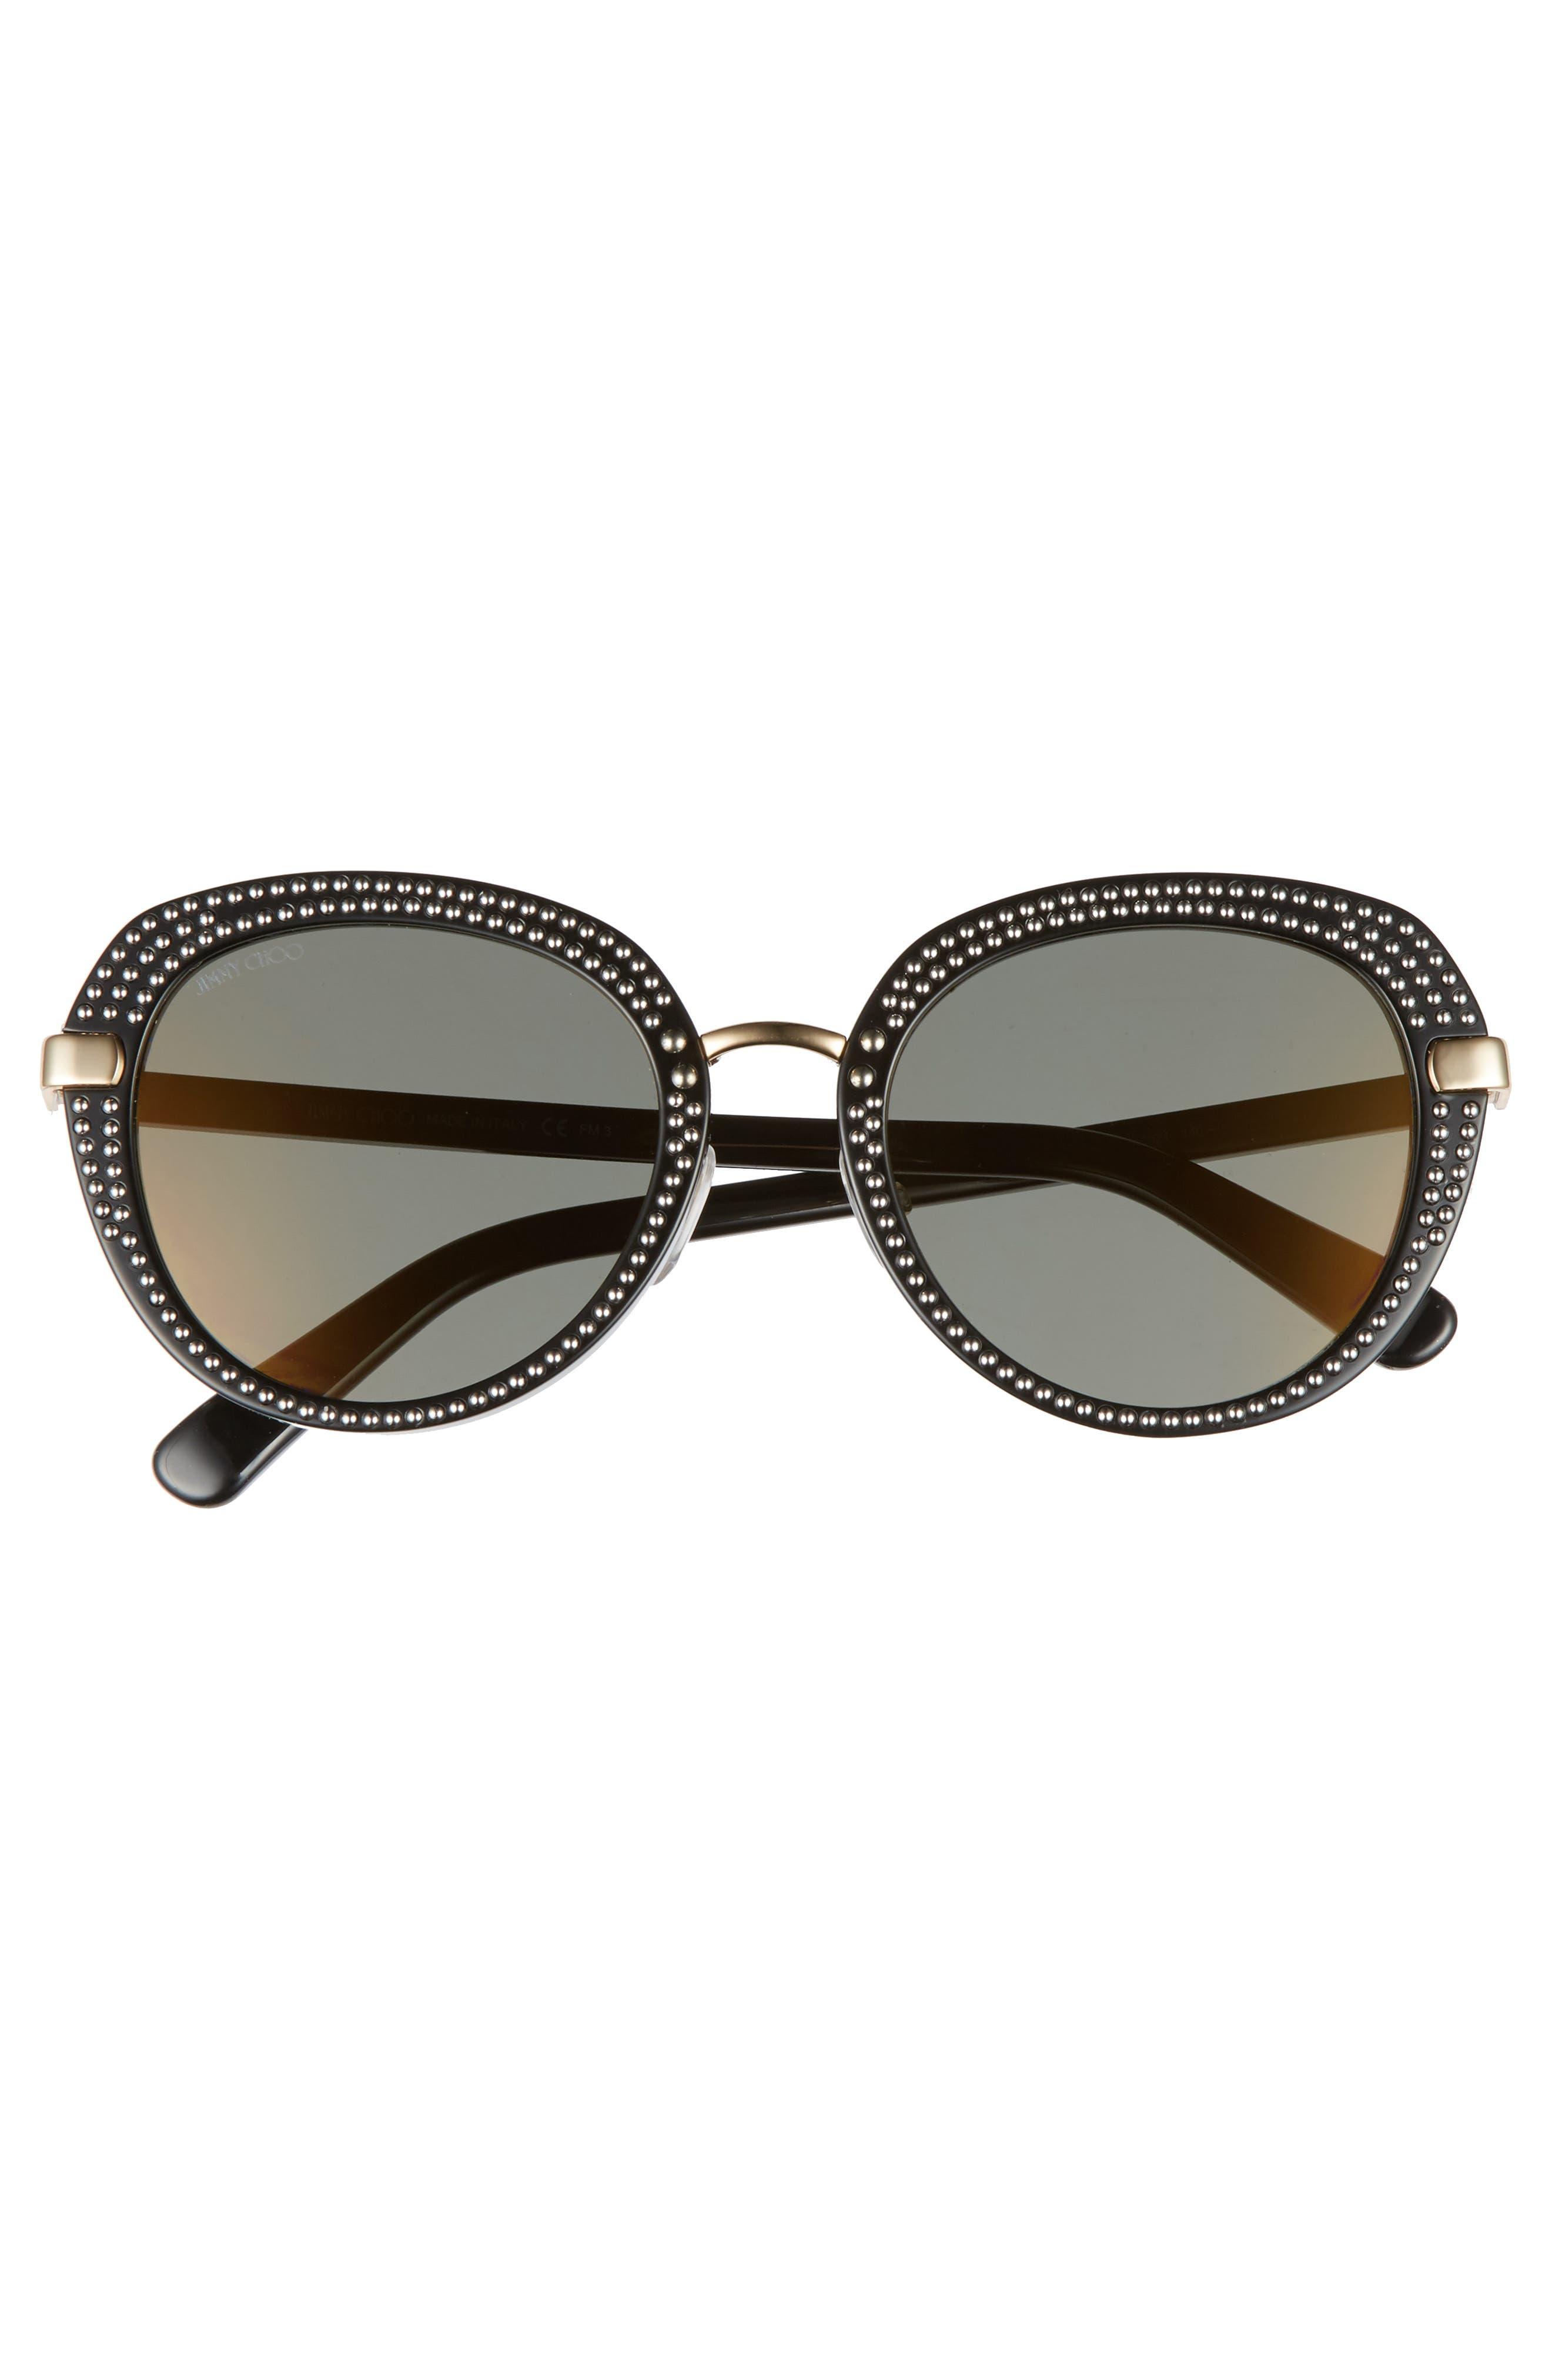 Moris 52mm Oversize Sunglasses,                             Alternate thumbnail 3, color,                             Black Gold